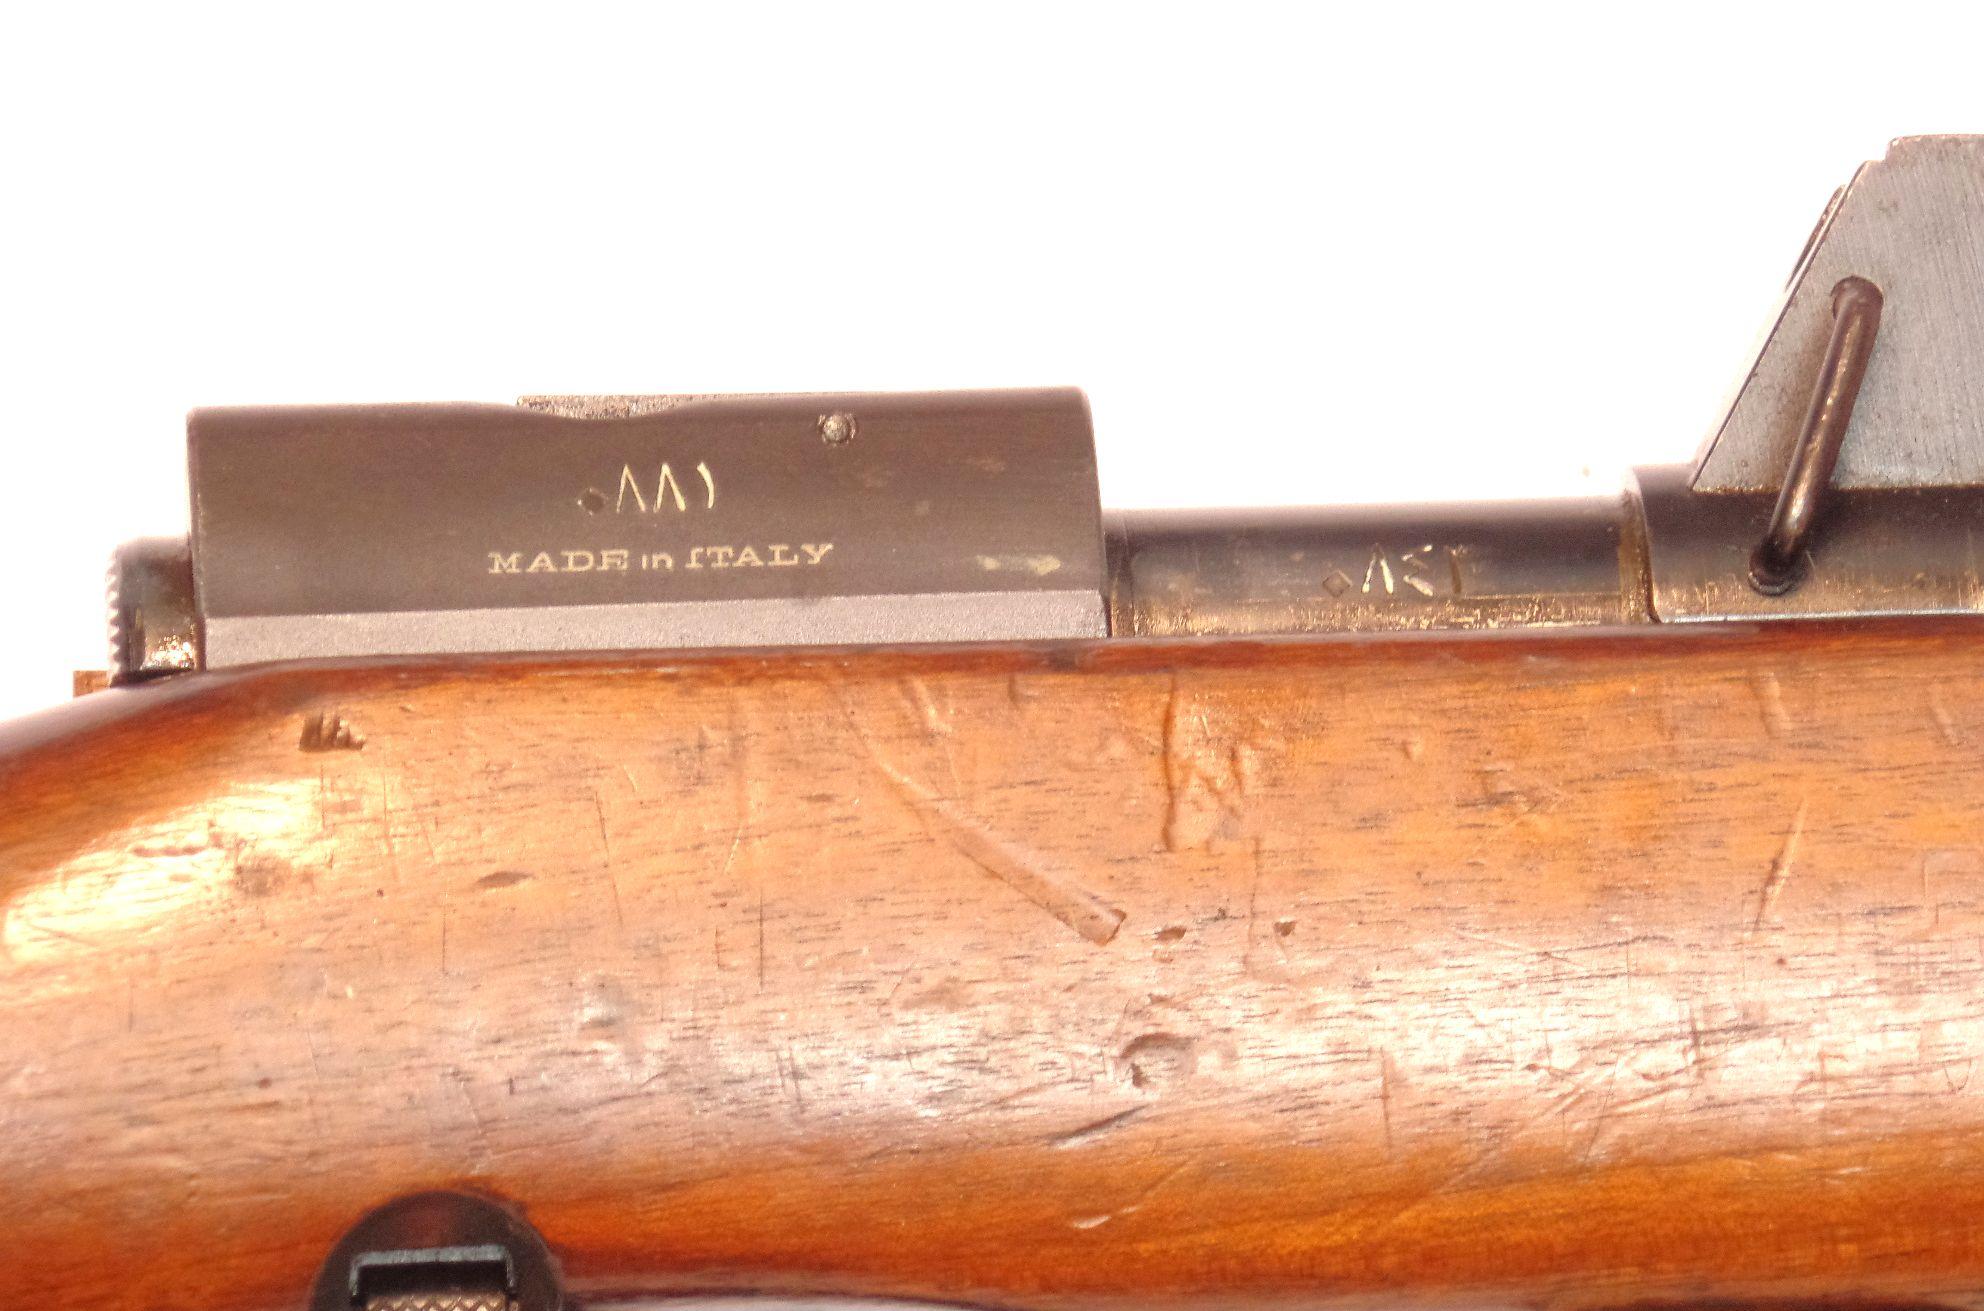 HAKIM Ljungman AG-42 calibre 22LR